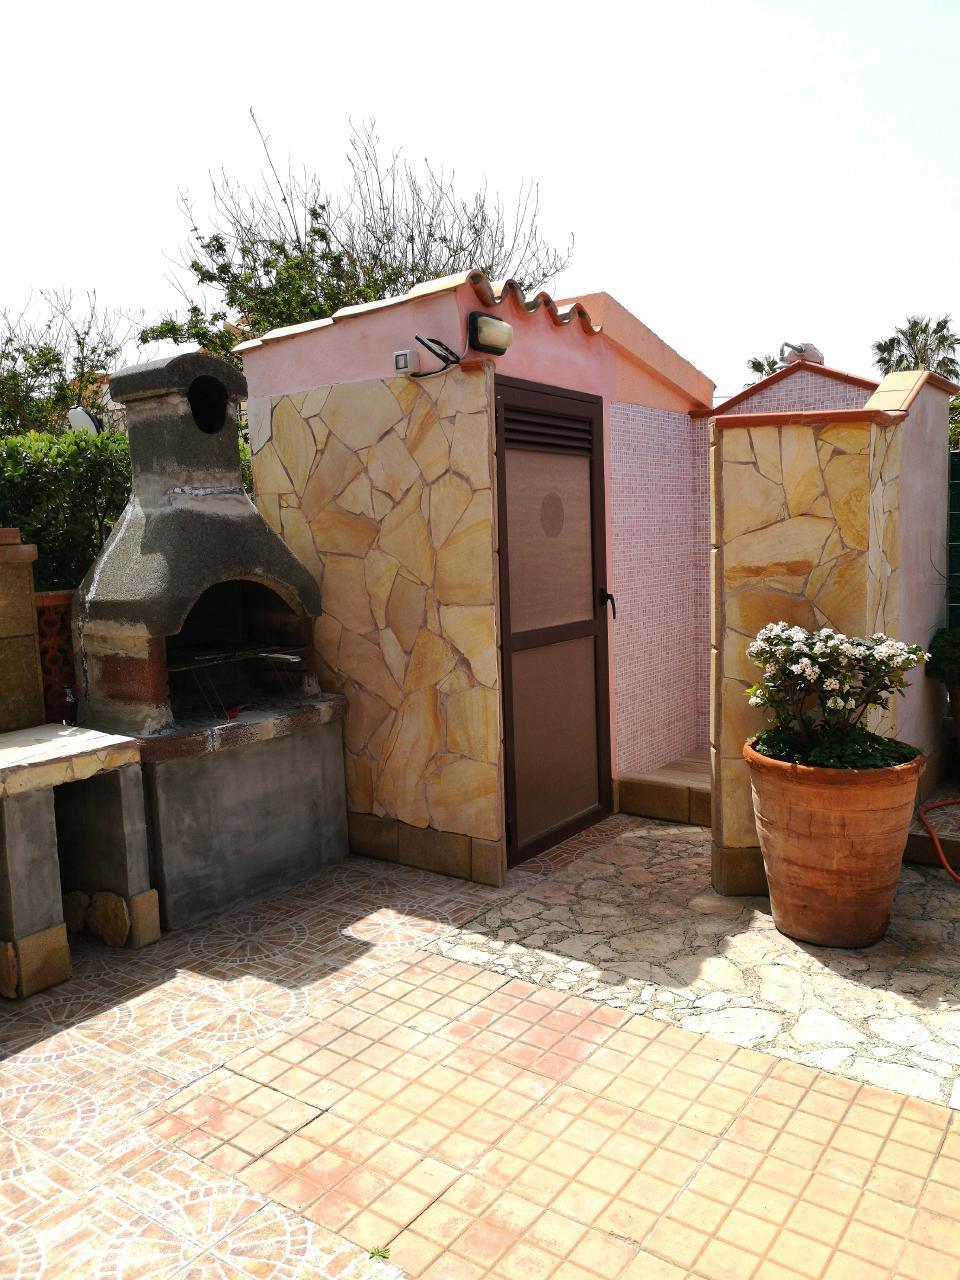 Maison de vacances Costa Mediterranea Ferienhaus (2144931), Cefalù, Palermo, Sicile, Italie, image 25